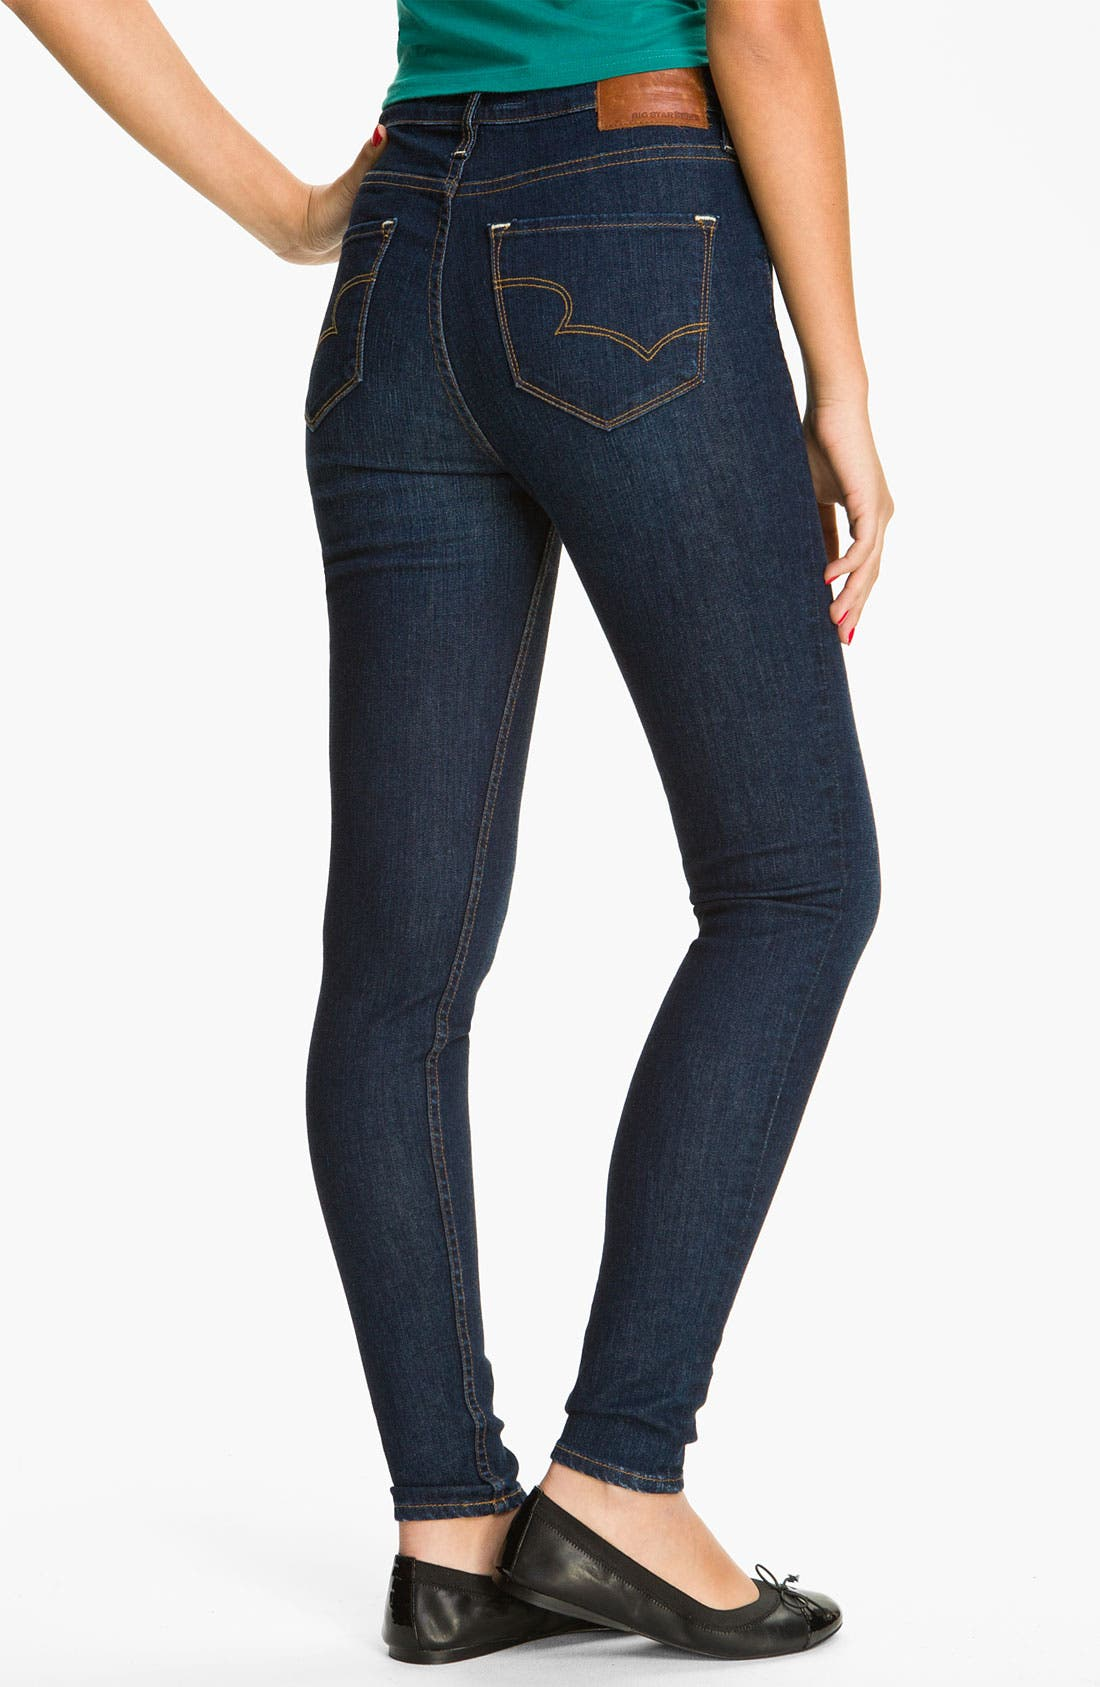 Alternate Image 1 Selected - Big Star 'Avalon' Skinny Jeans (Flux) (Juniors)